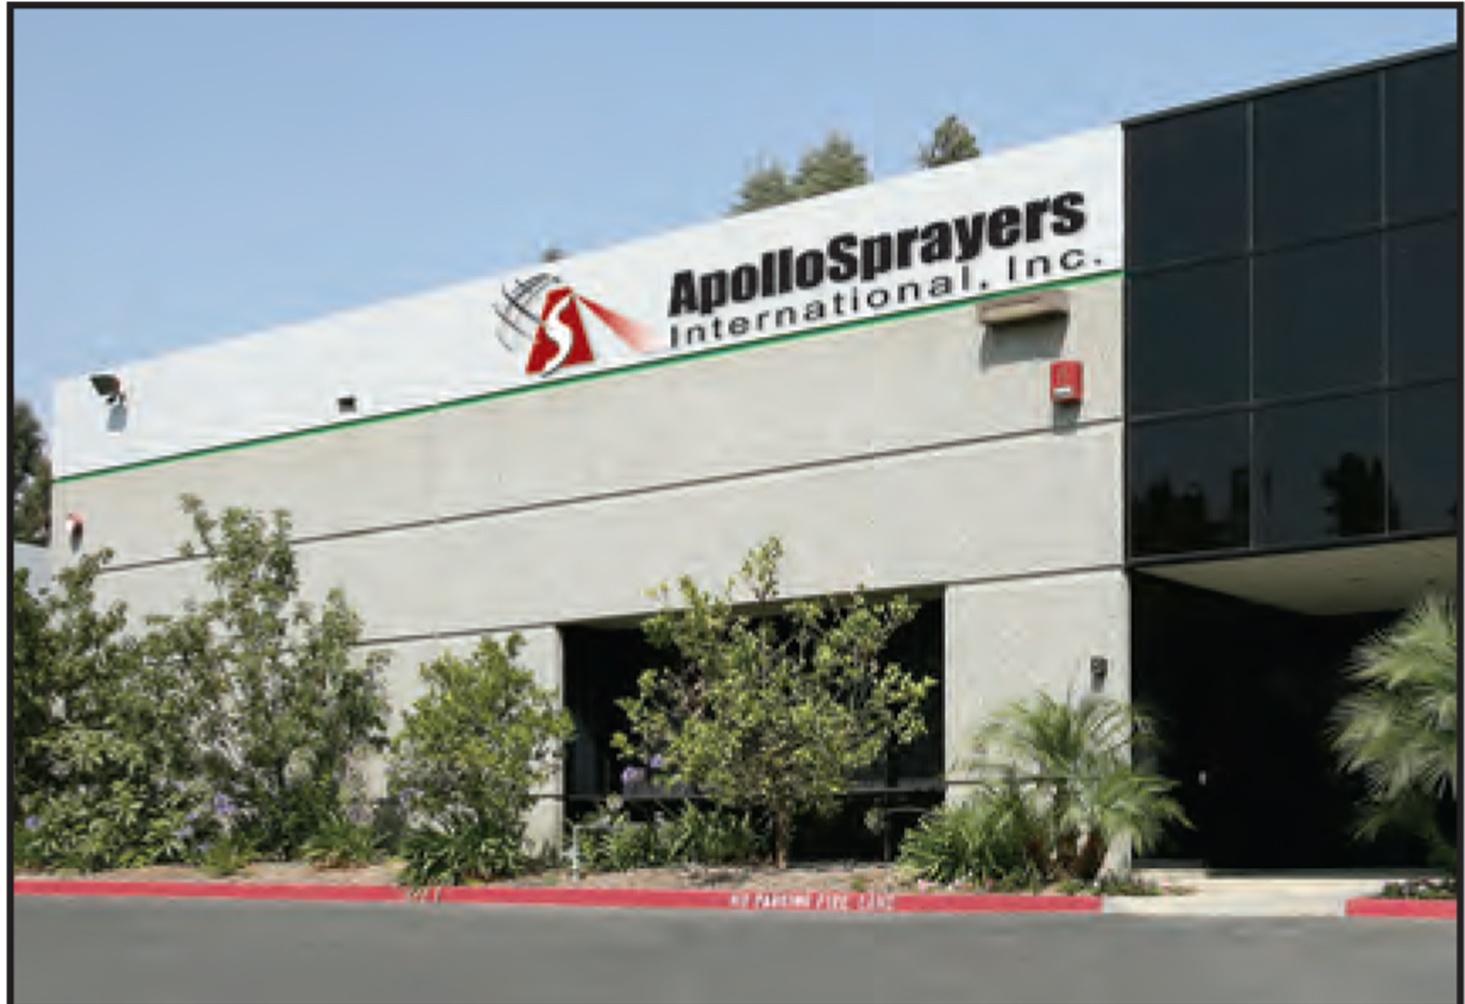 Apollo-Sprayers-Building.jpg